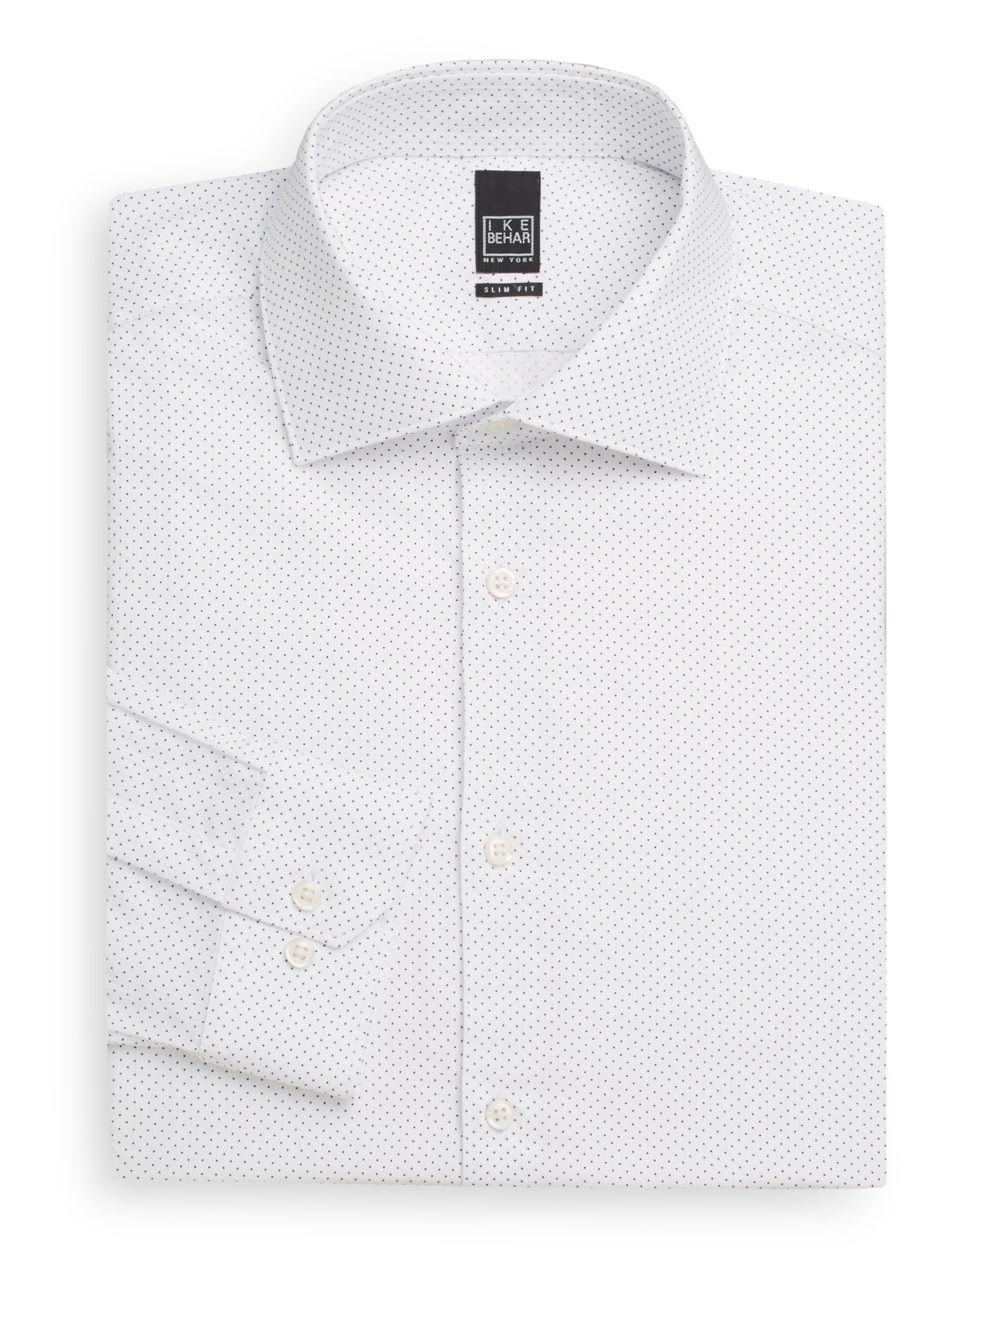 Ike behar slim fit pindot 102 39 s two ply cotton dress shirt for 2 ply cotton dress shirt